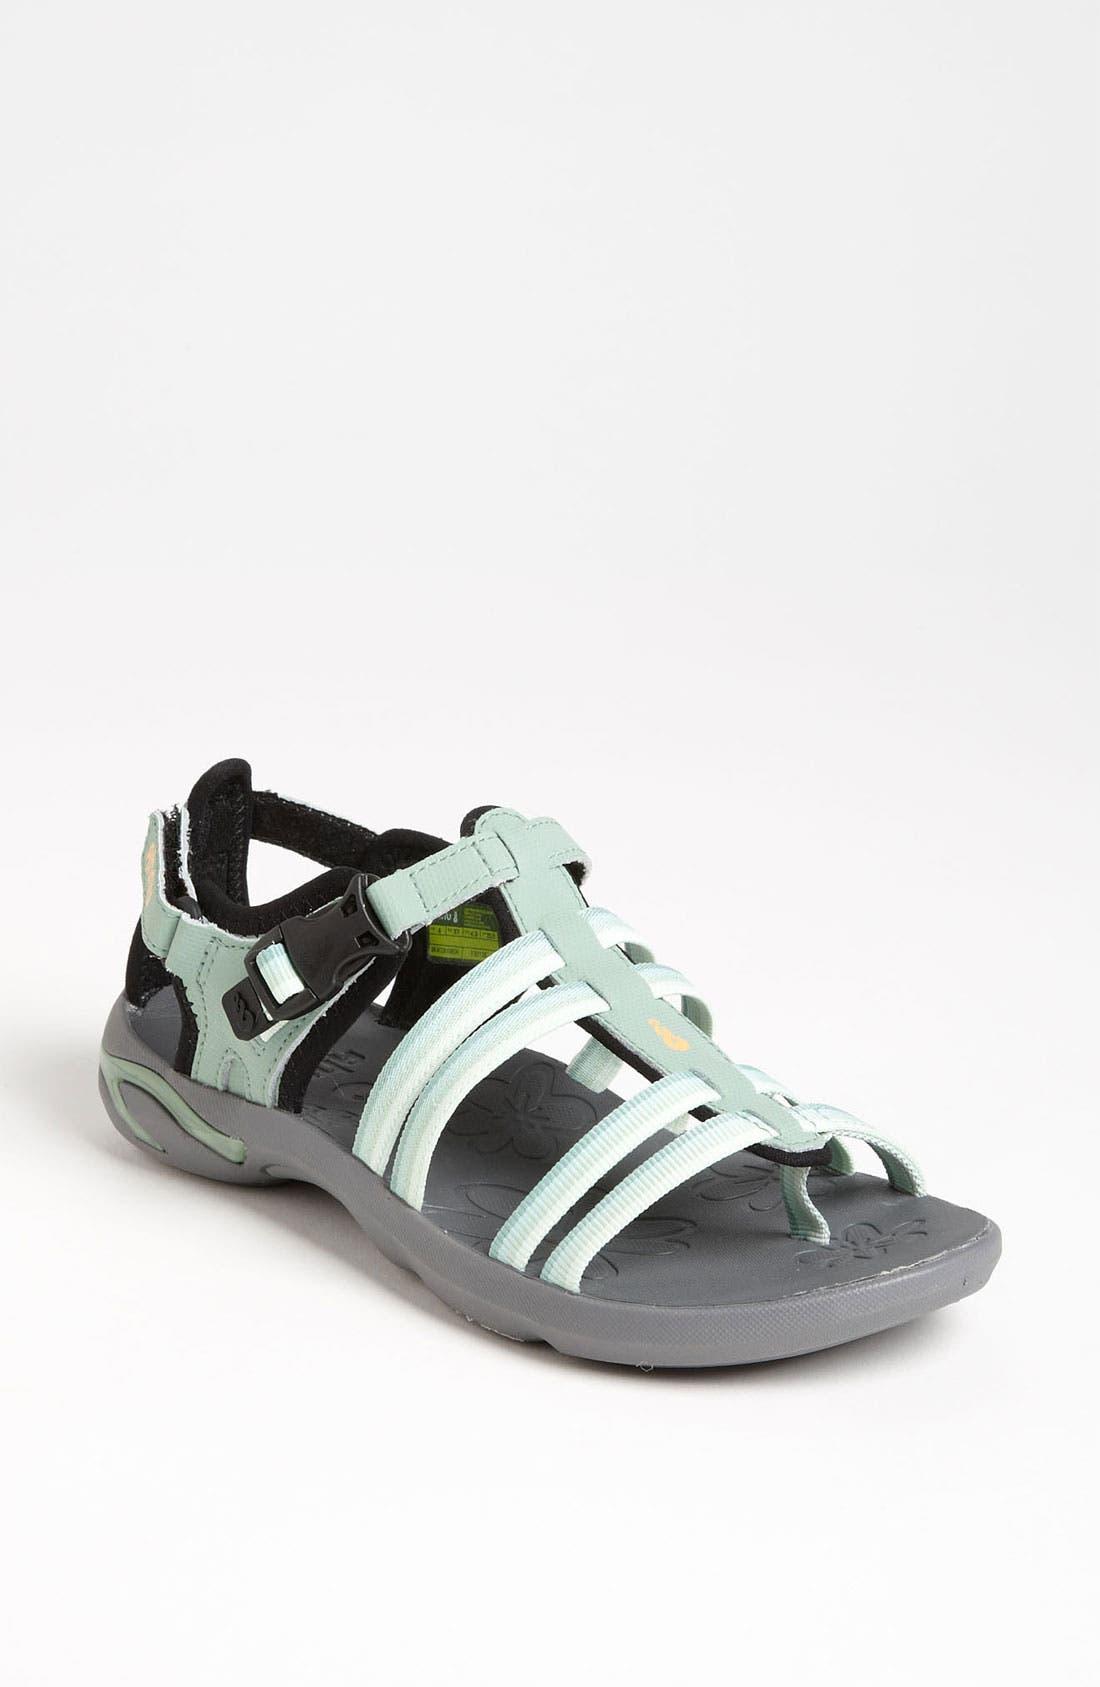 Alternate Image 1 Selected - Ahnu 'Pescadero' Sandal